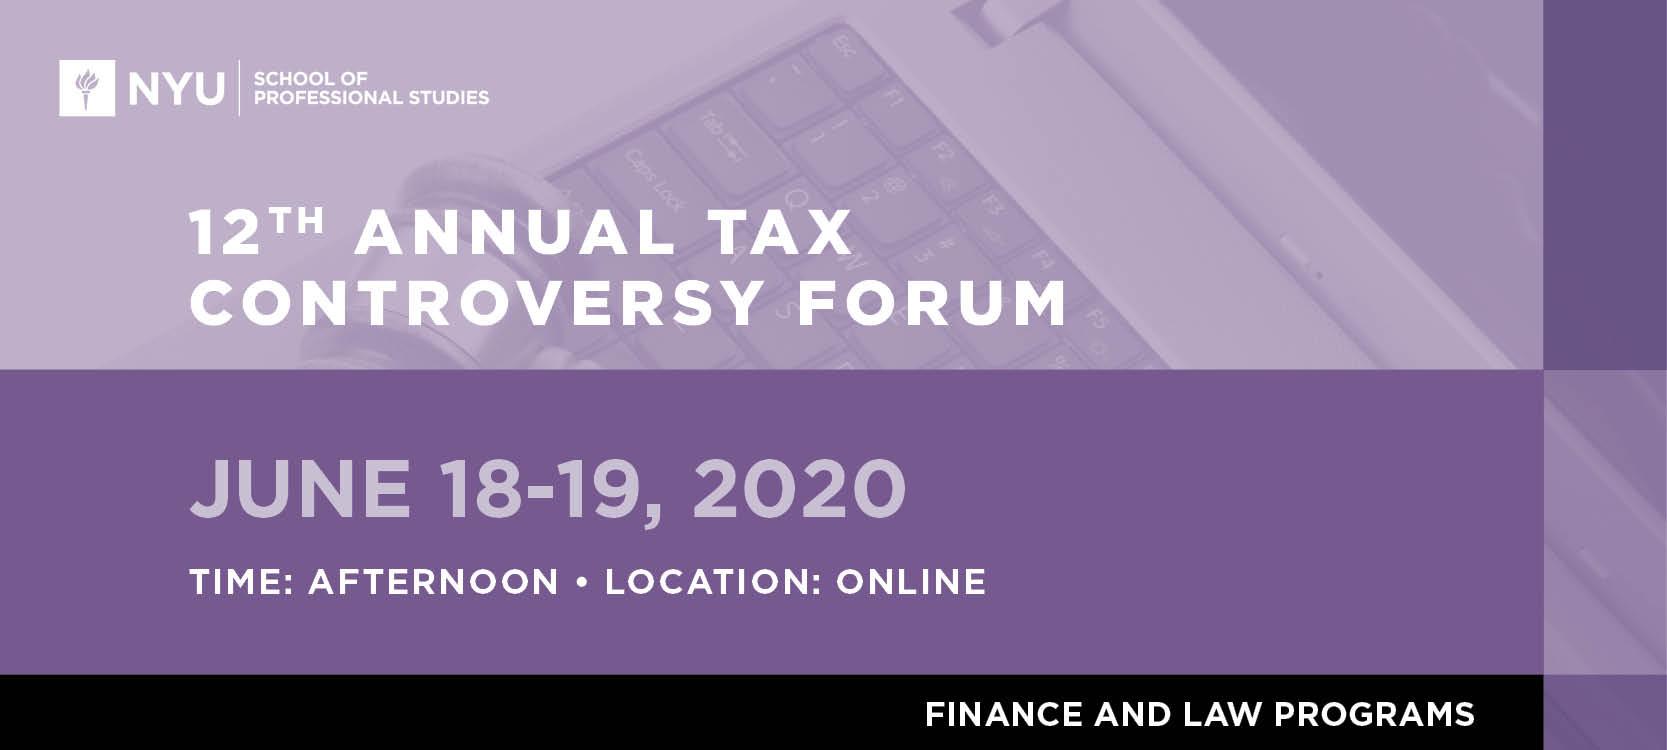 12th Annual Tax Controversy Forum Webinar Sessions